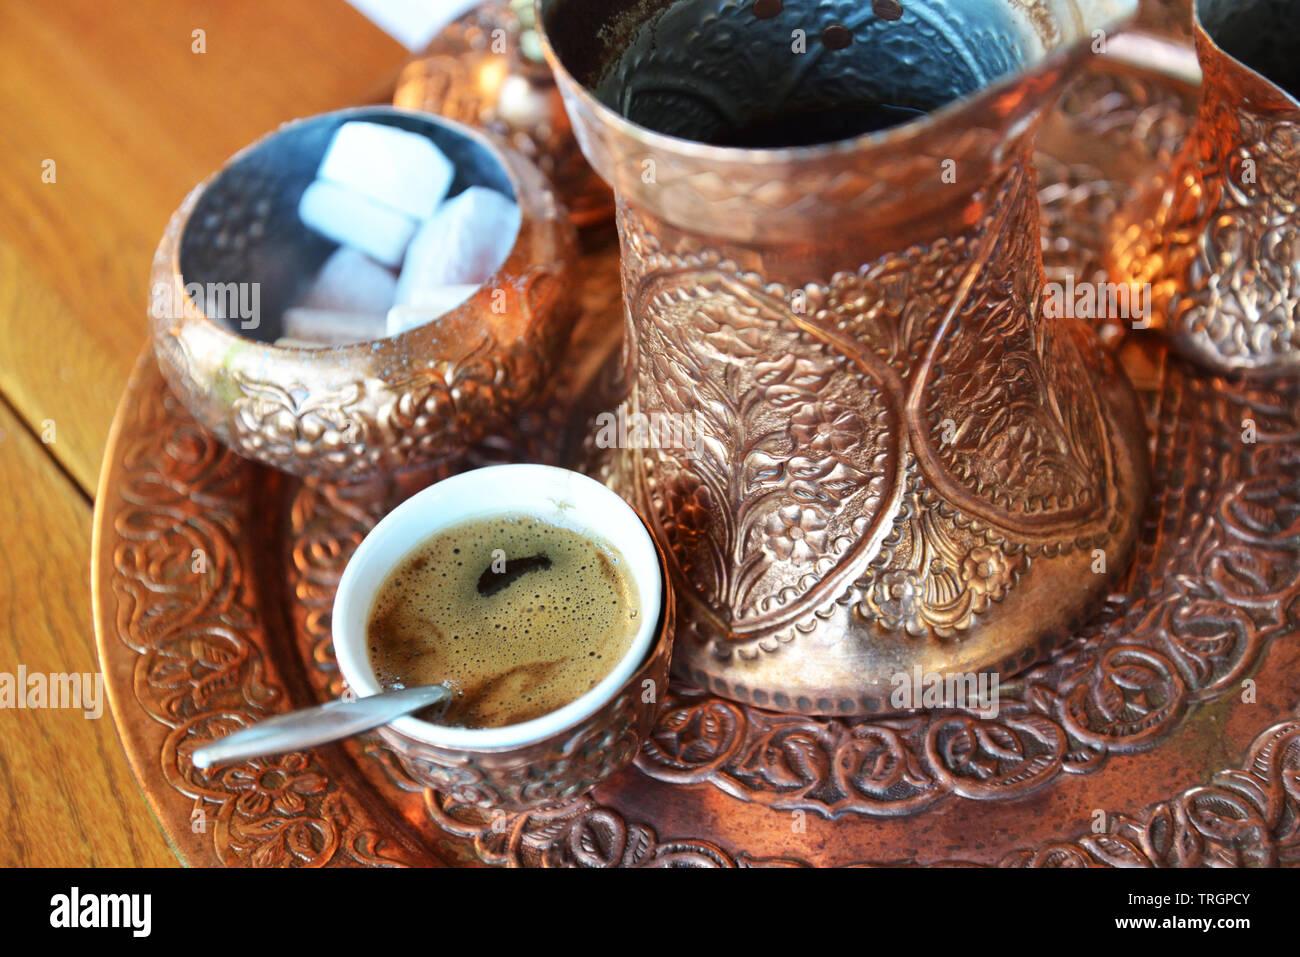 Visite de Sarajavo, boire du café bosniaque Photo Stock